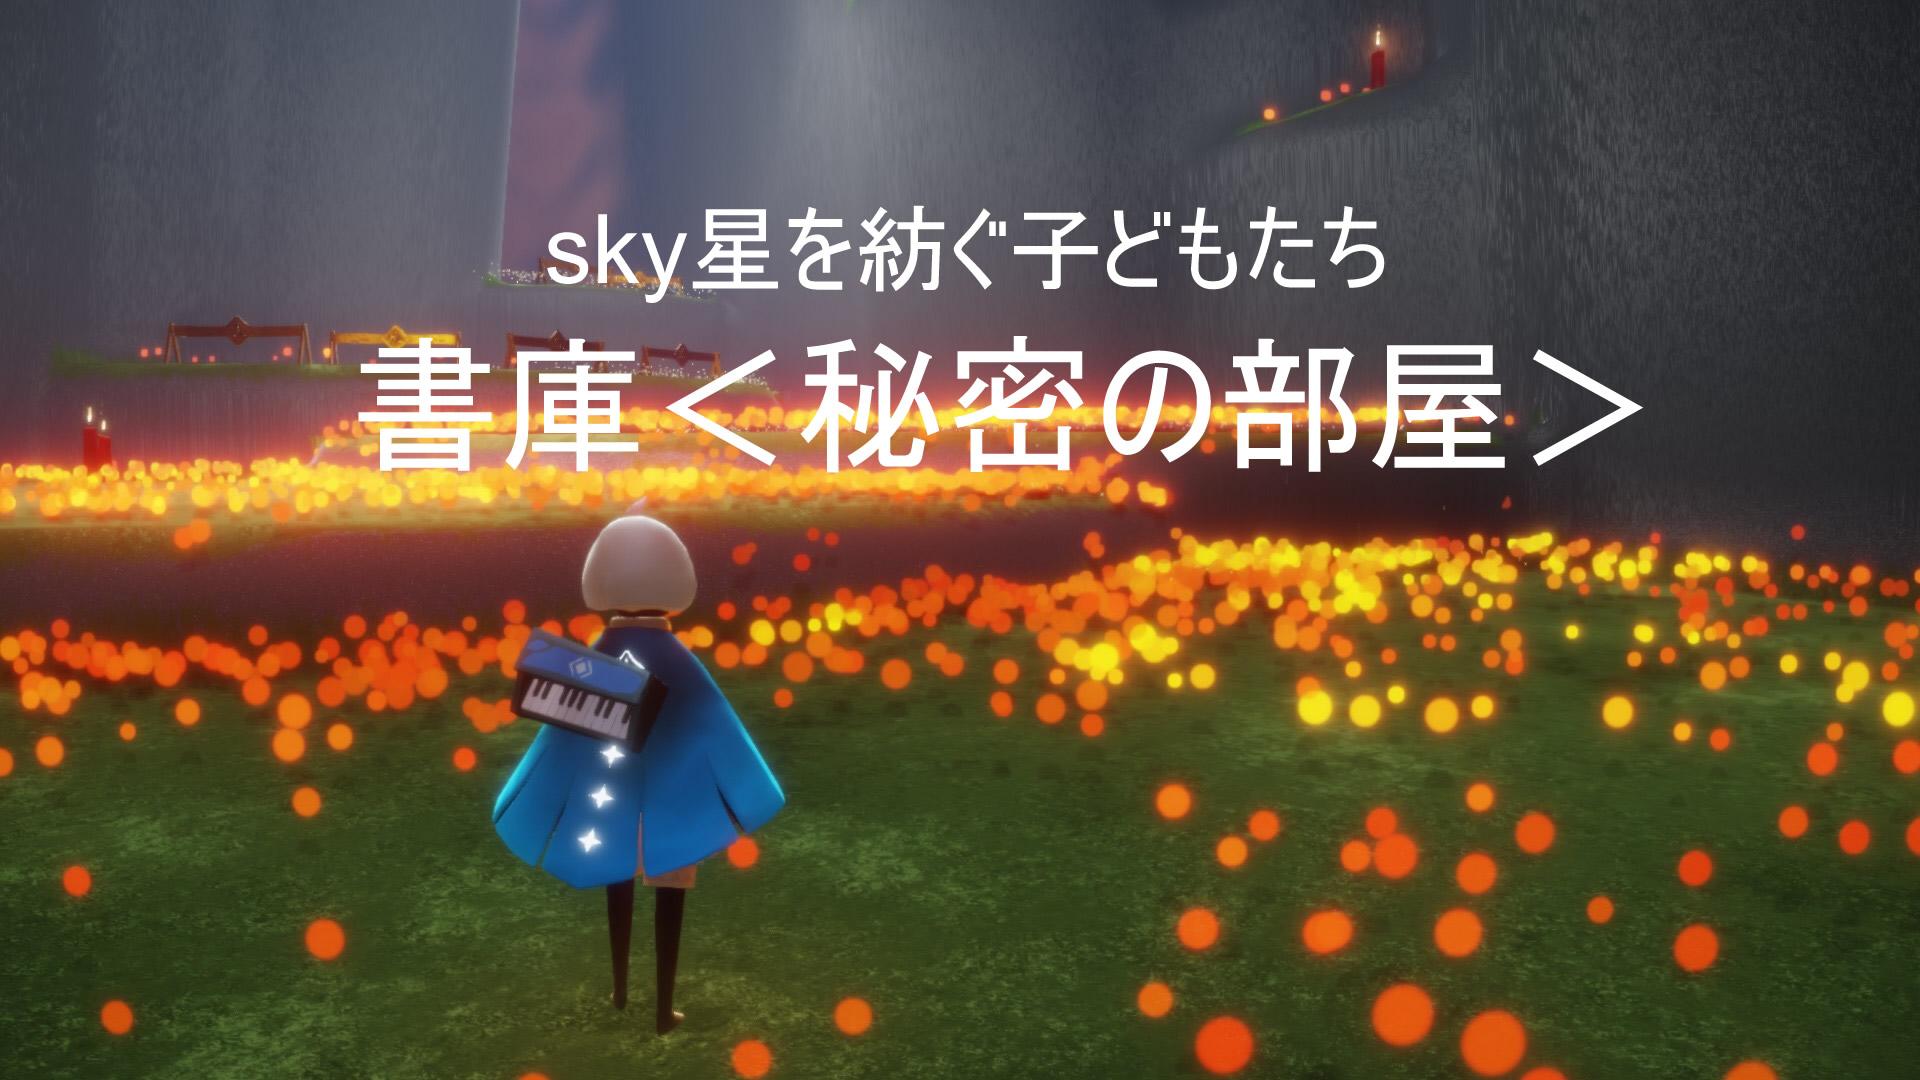 sky 星 を 紡ぐ 子供 たち